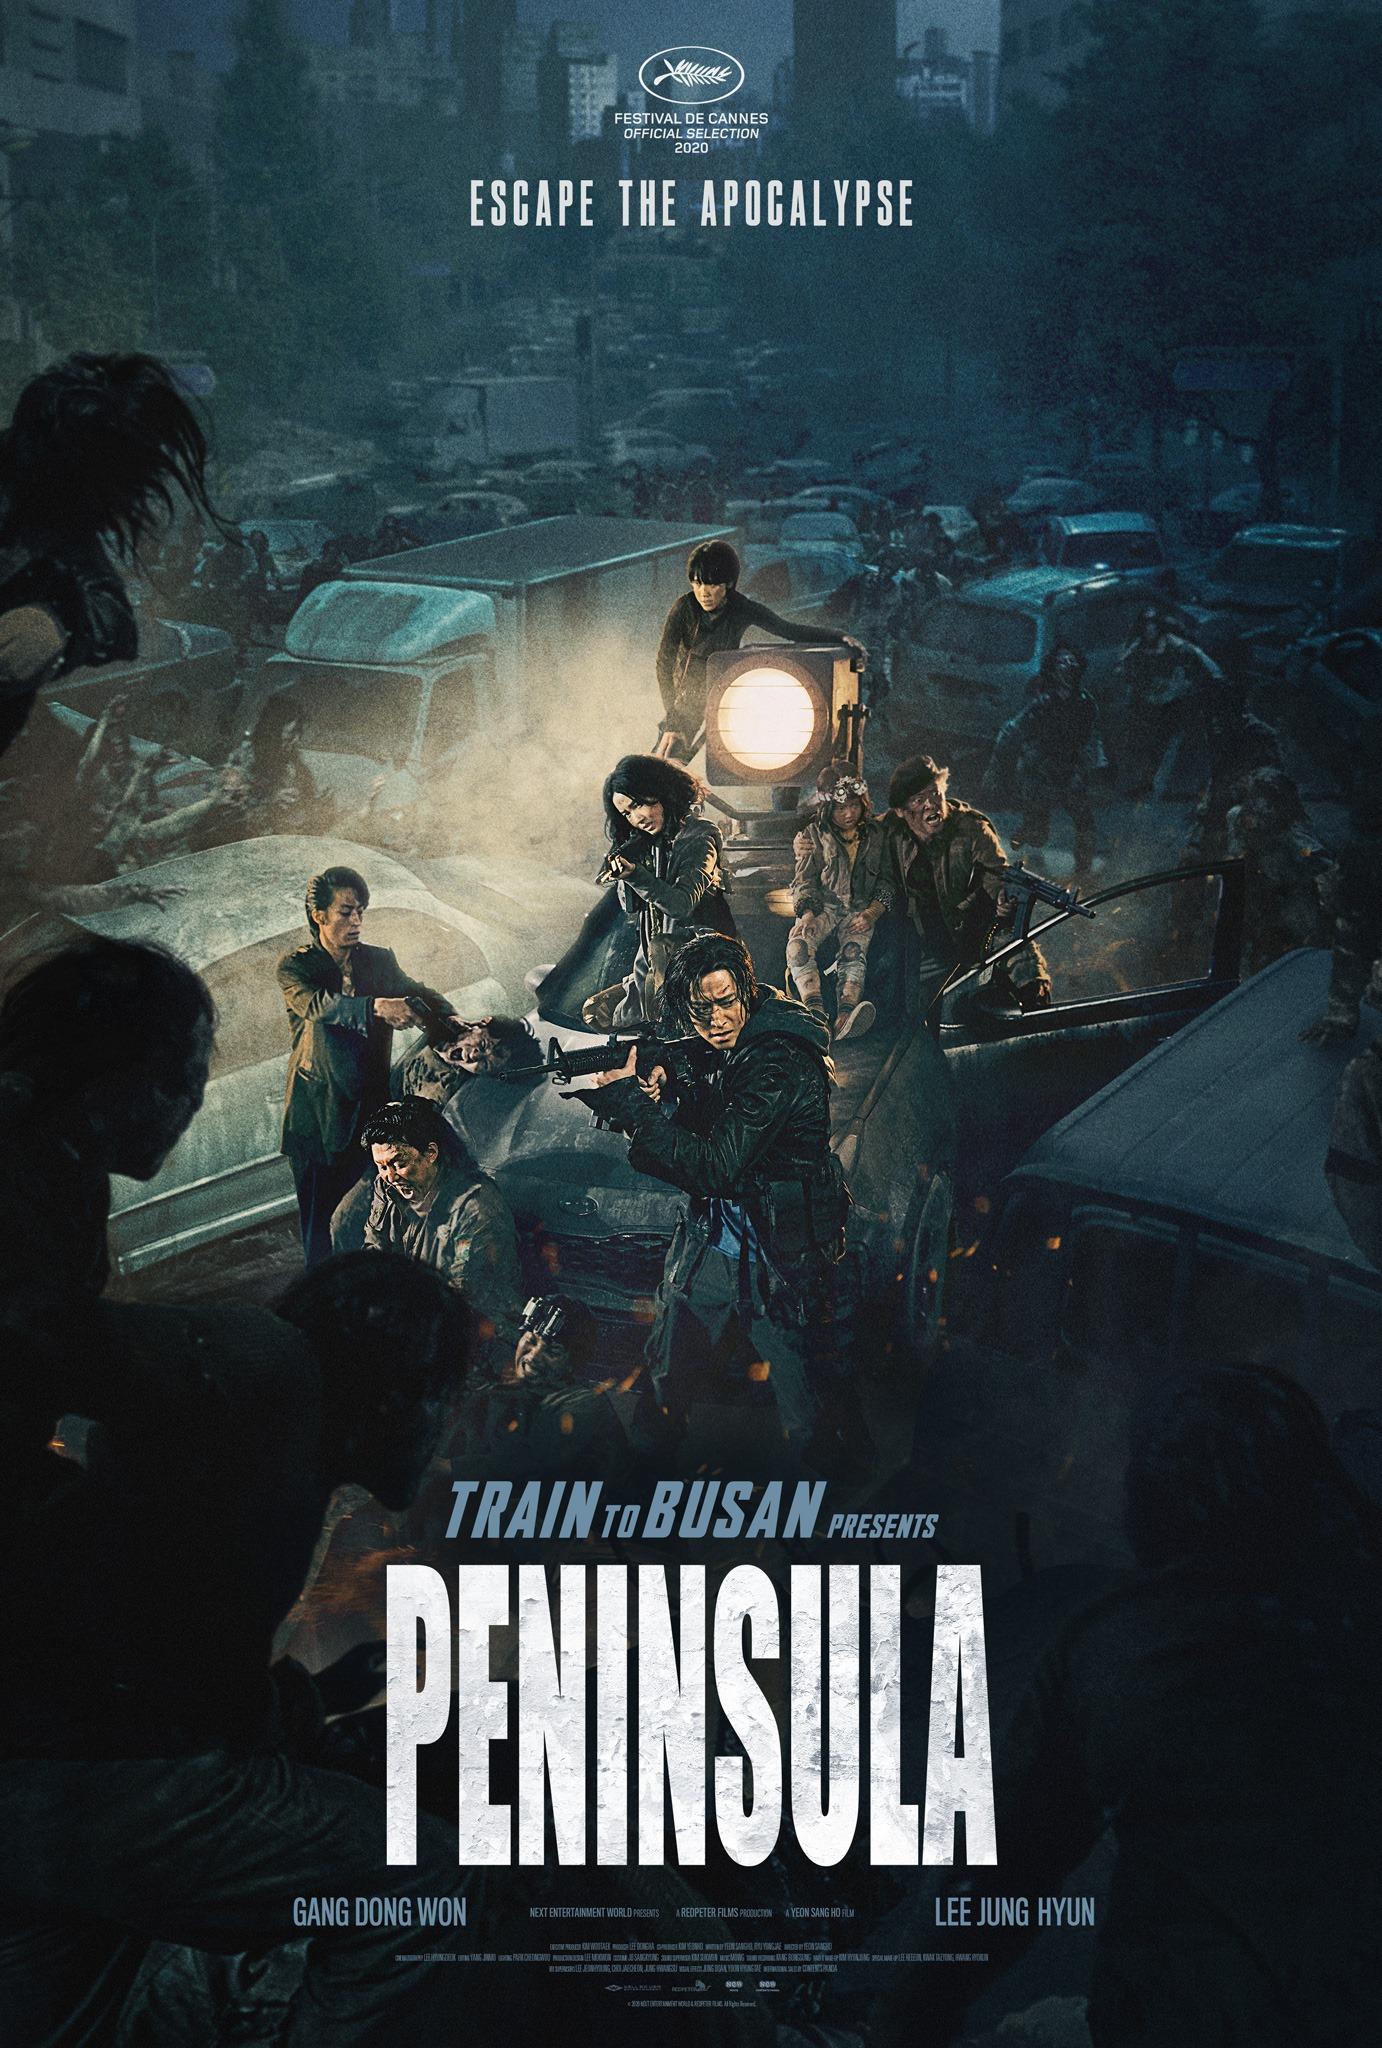 Train To Busan Presents Peninsula affiche film